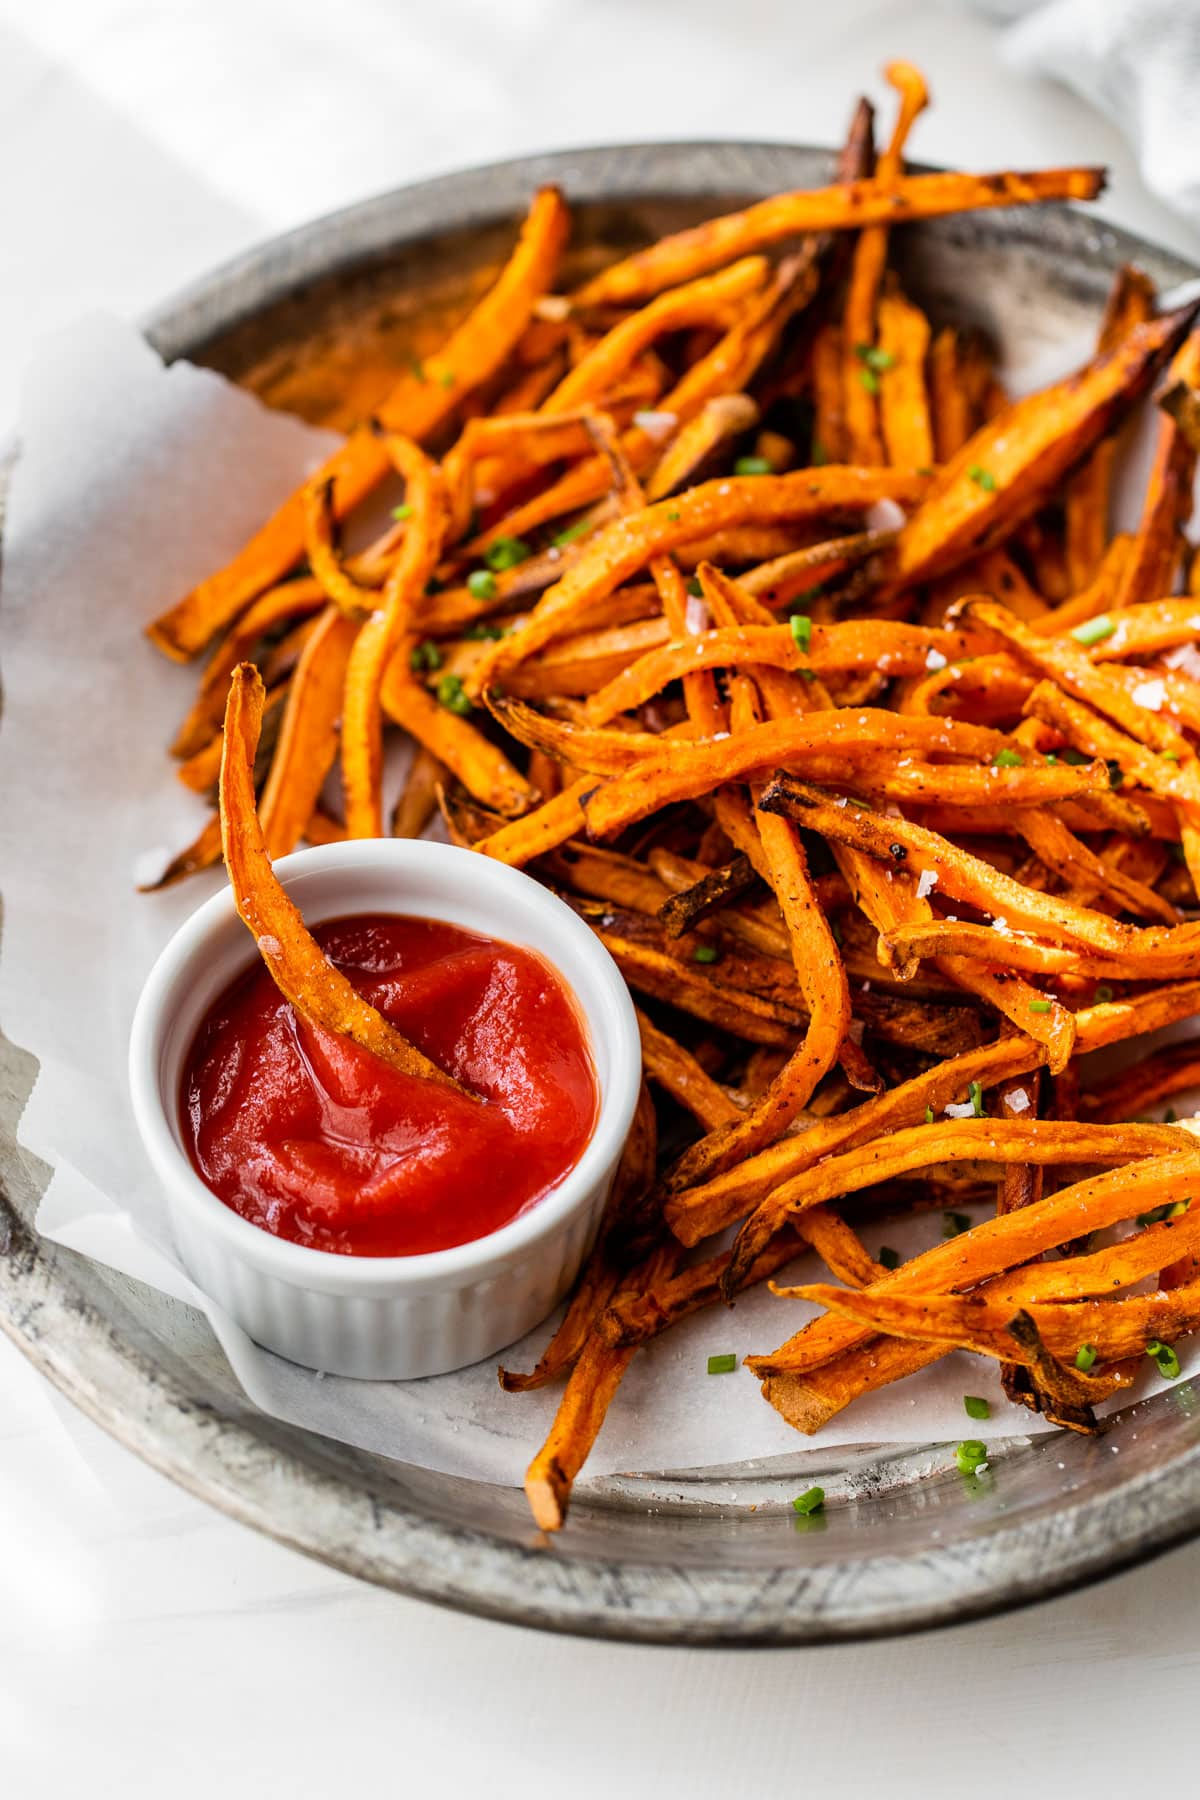 air fryer sweet potato fries on a plate